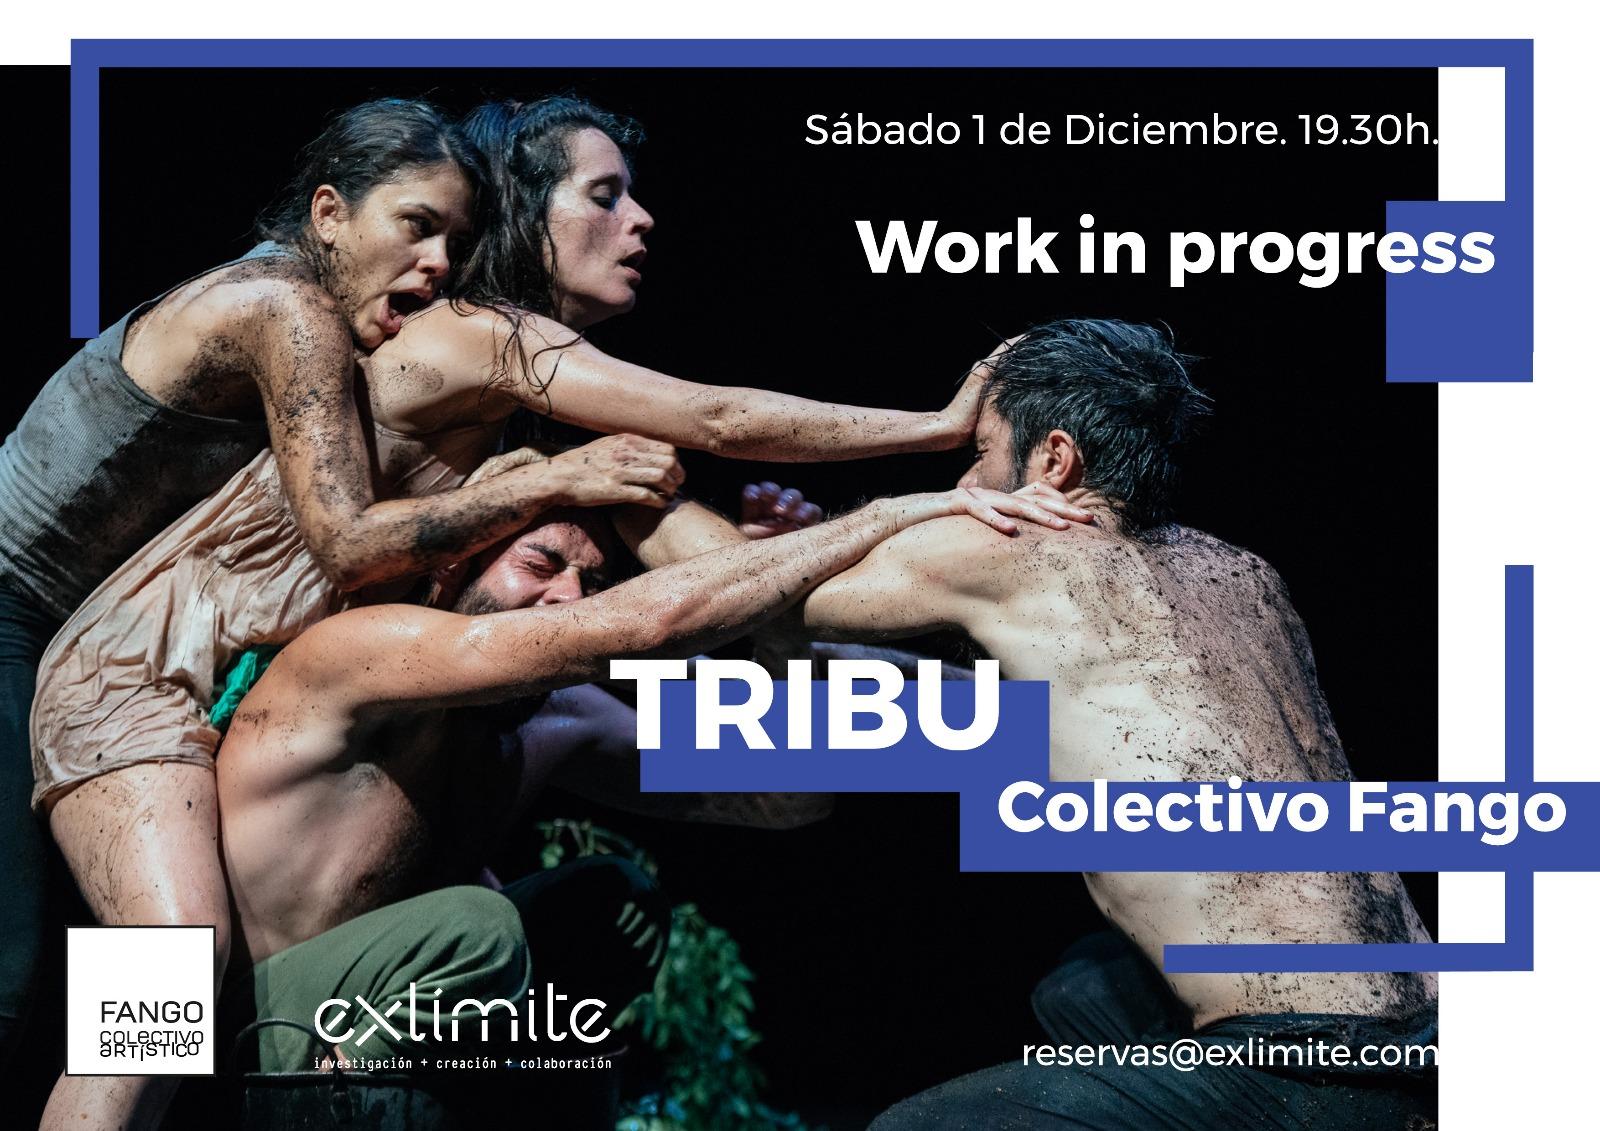 TRIBU work in progress photo Danilo Moroni.jpeg